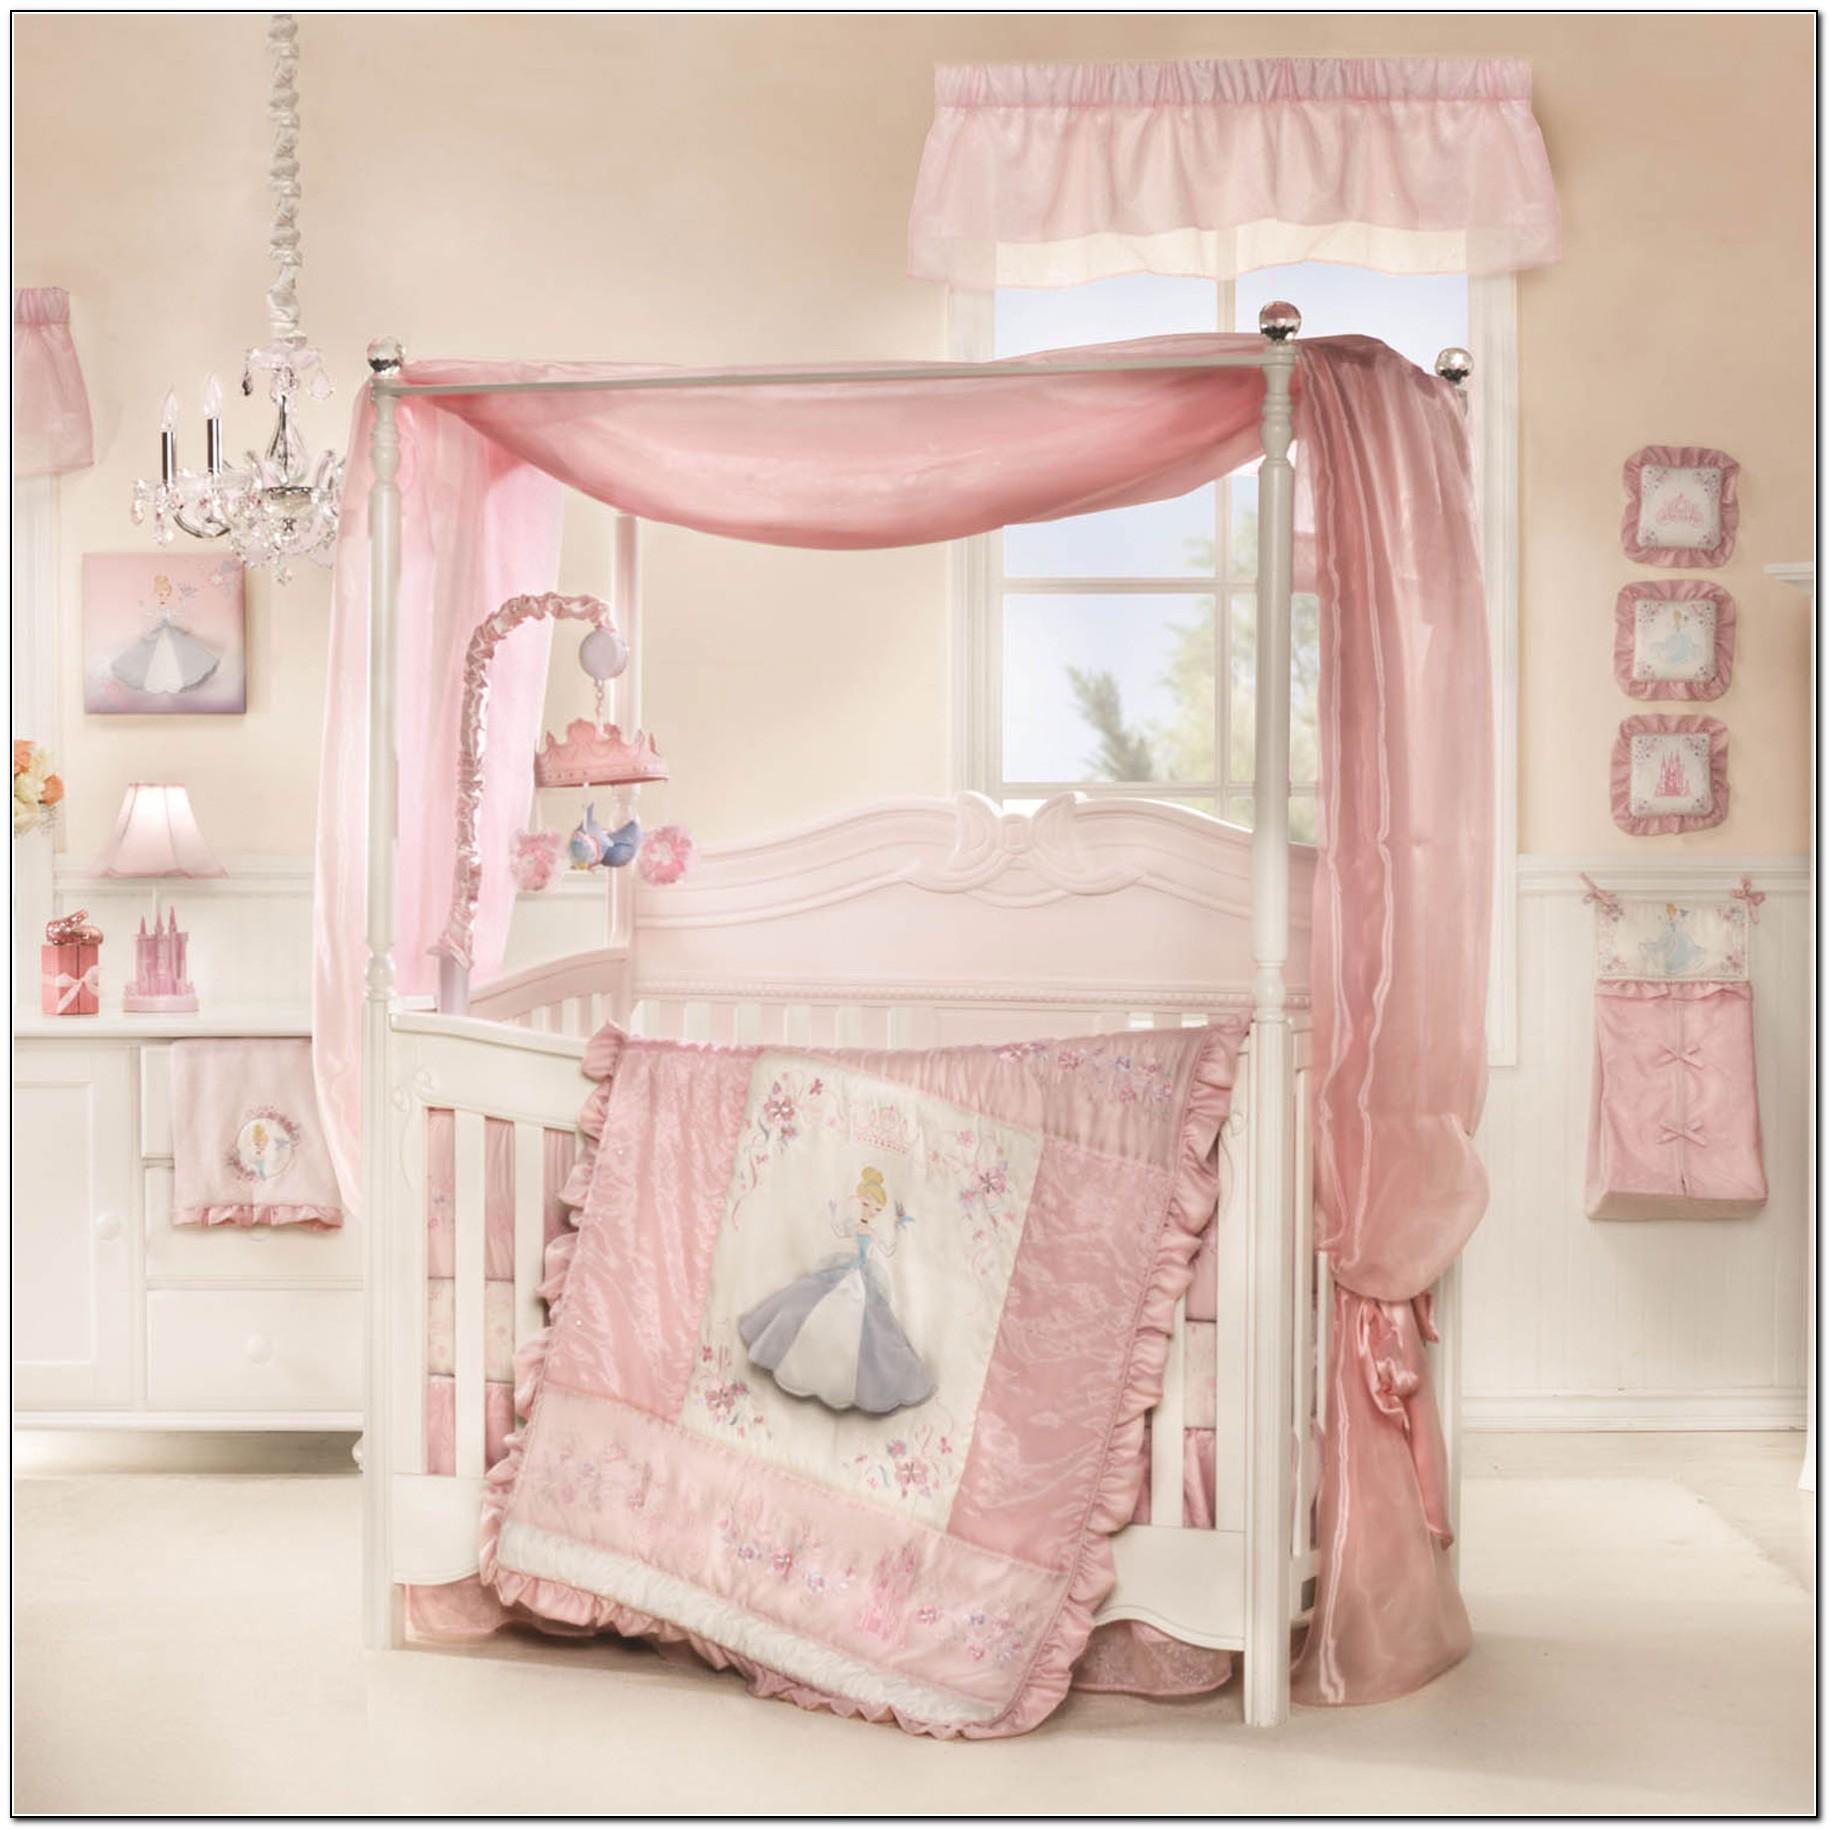 Crib Bedding For Girls Princess